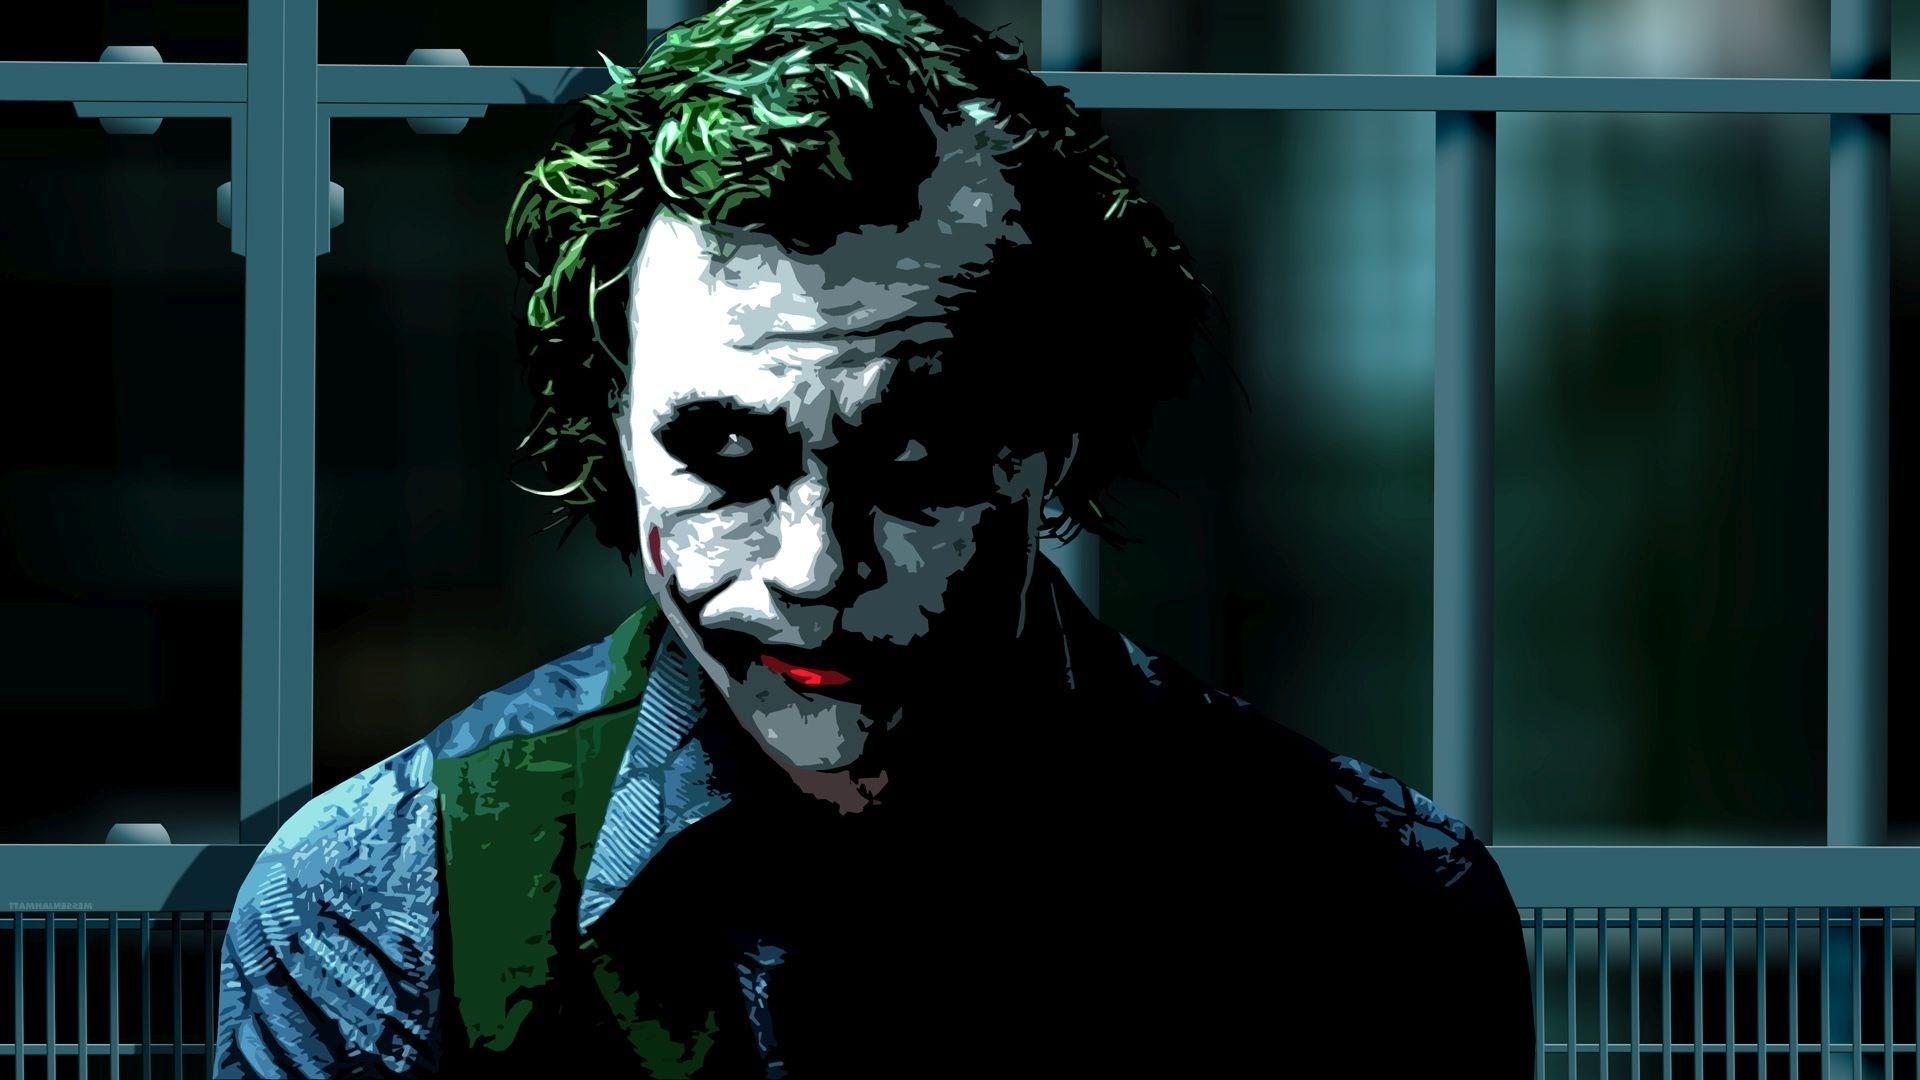 joker hd wallpapers 1080p high quality